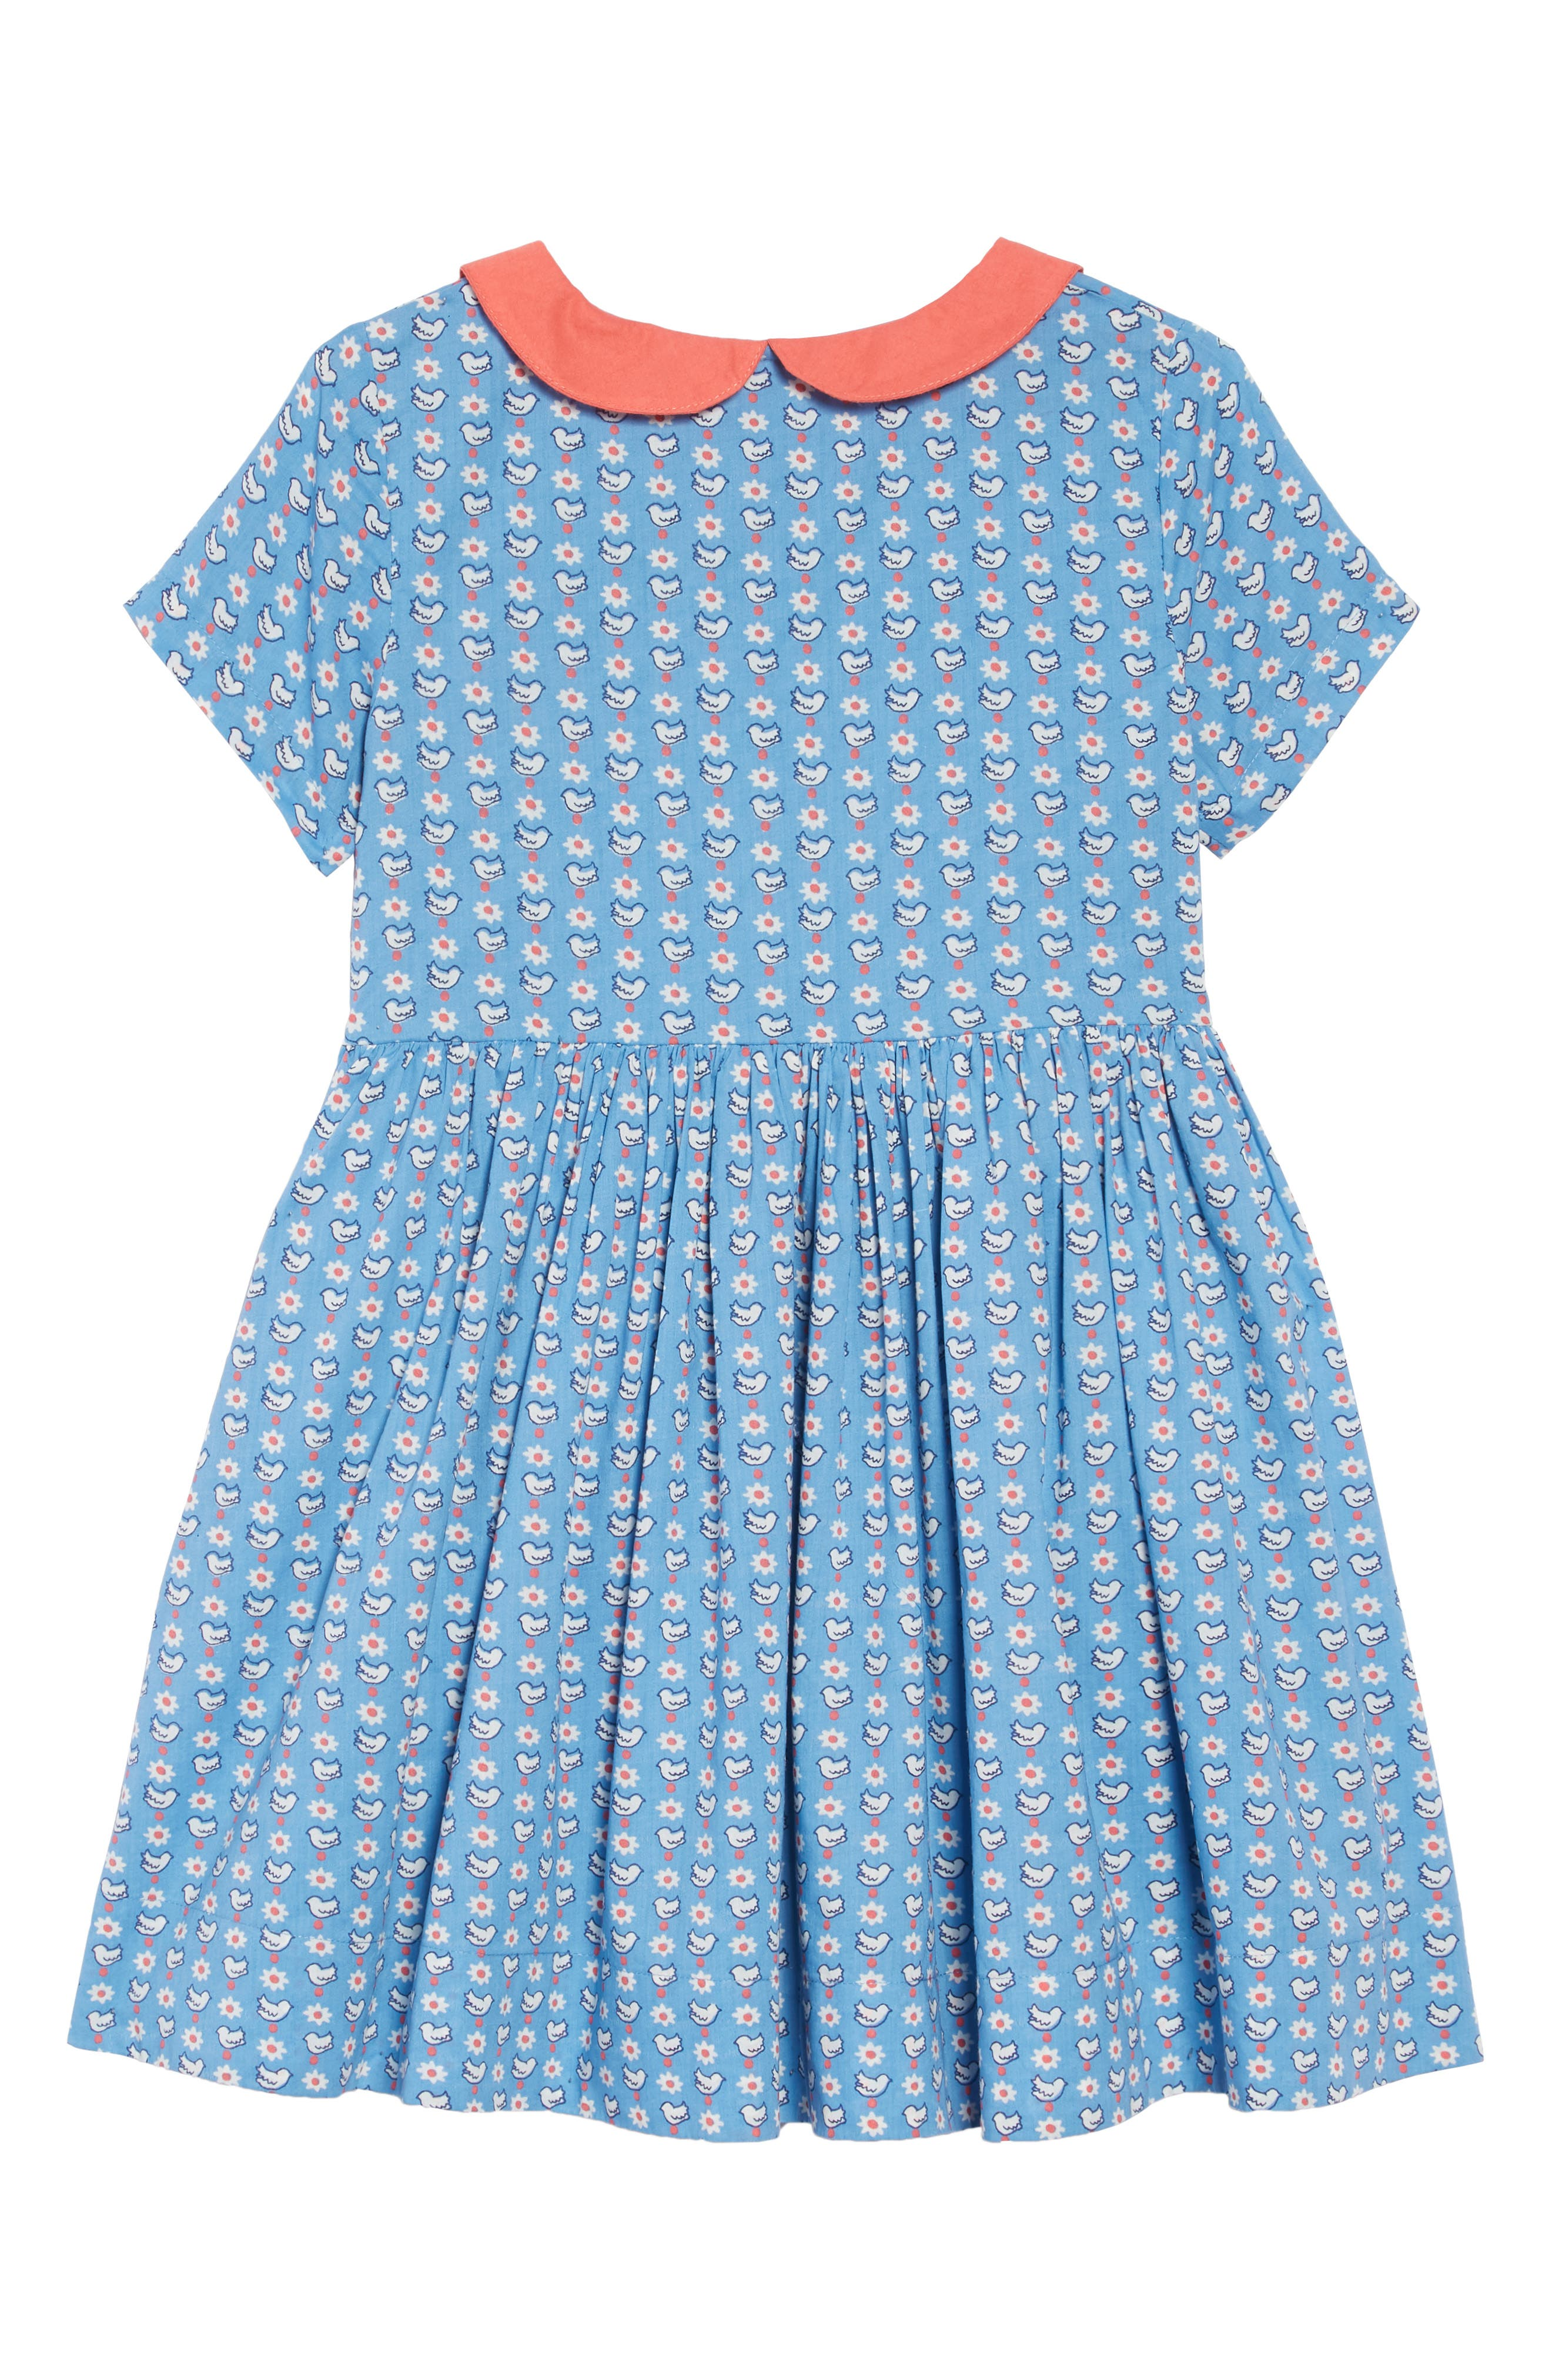 Nostalgic Collared Dress,                             Alternate thumbnail 2, color,                             454